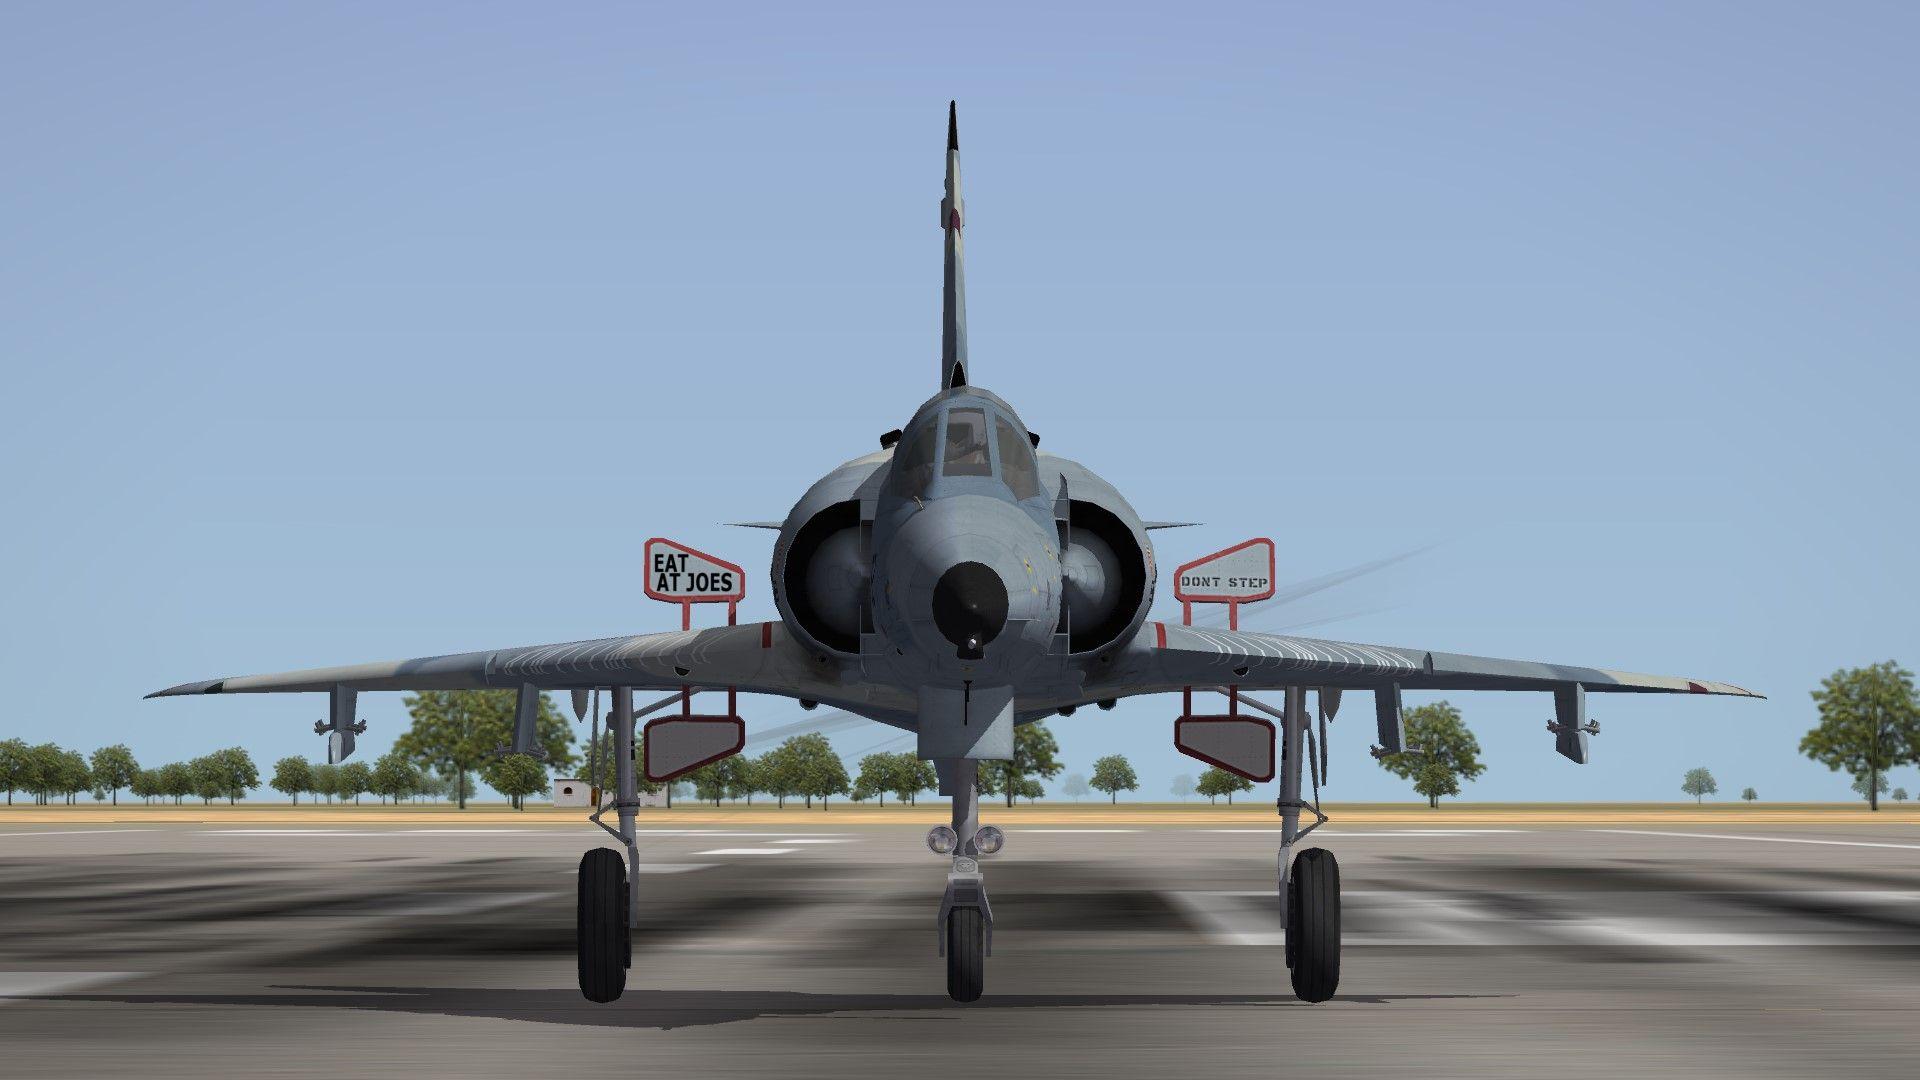 USNF-21AKFIR01_zpsc1358d26.jpg